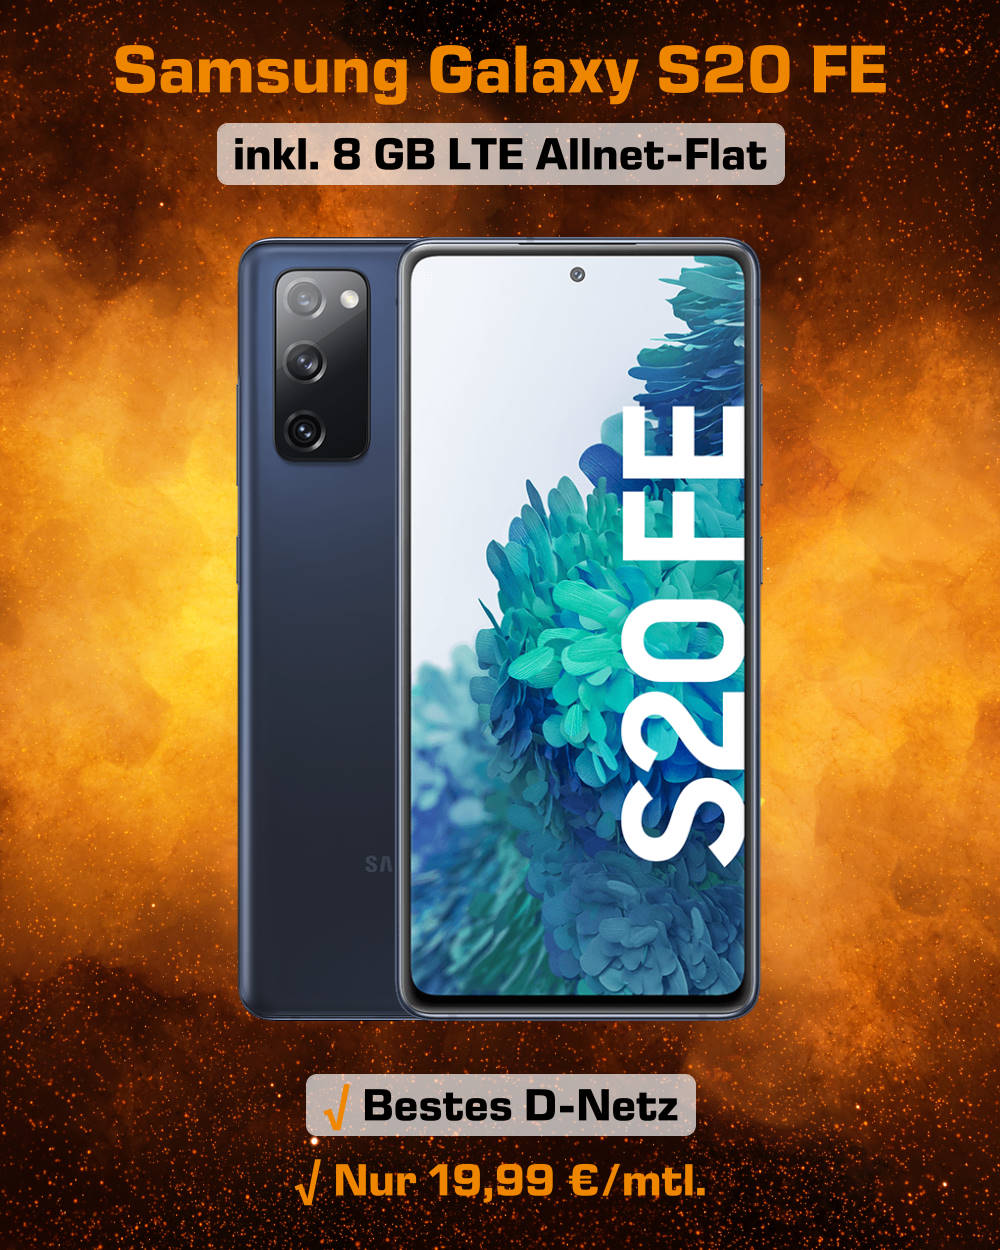 Galaxy S20 FE inkl. 8 GB LTE Allnet-Flat zum absoluten Bestpreis